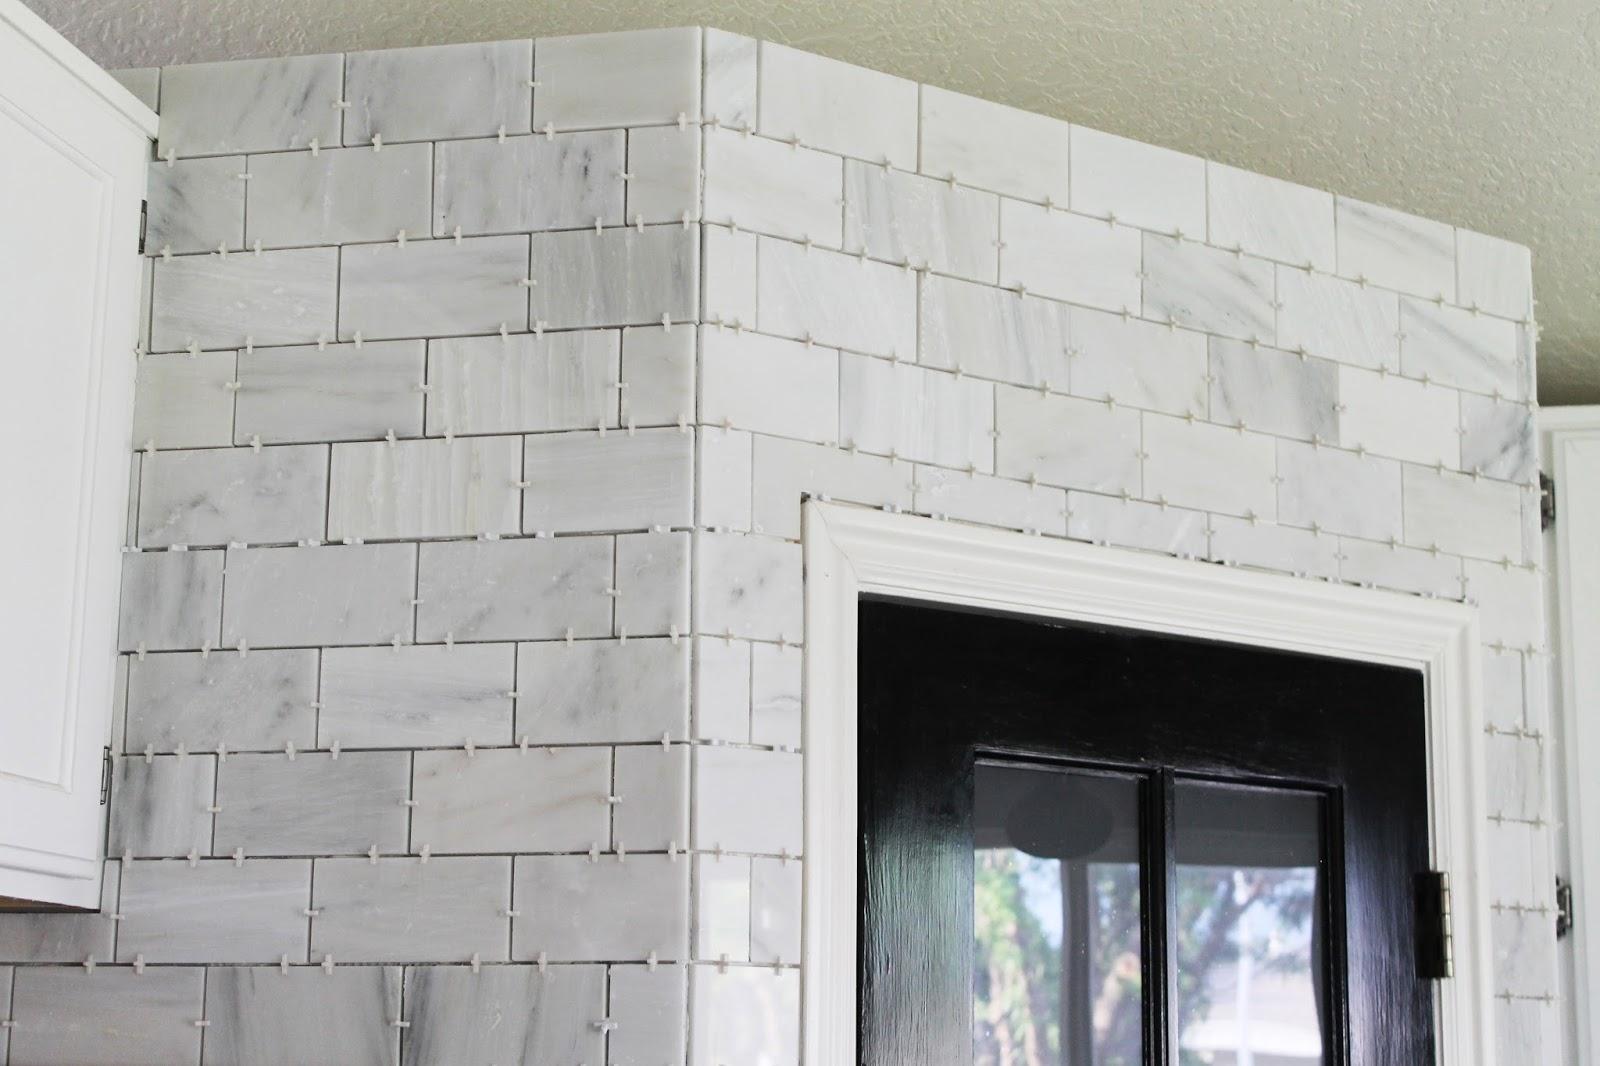 Carrara Marble Tile : Carrara marble backsplash homesfeed